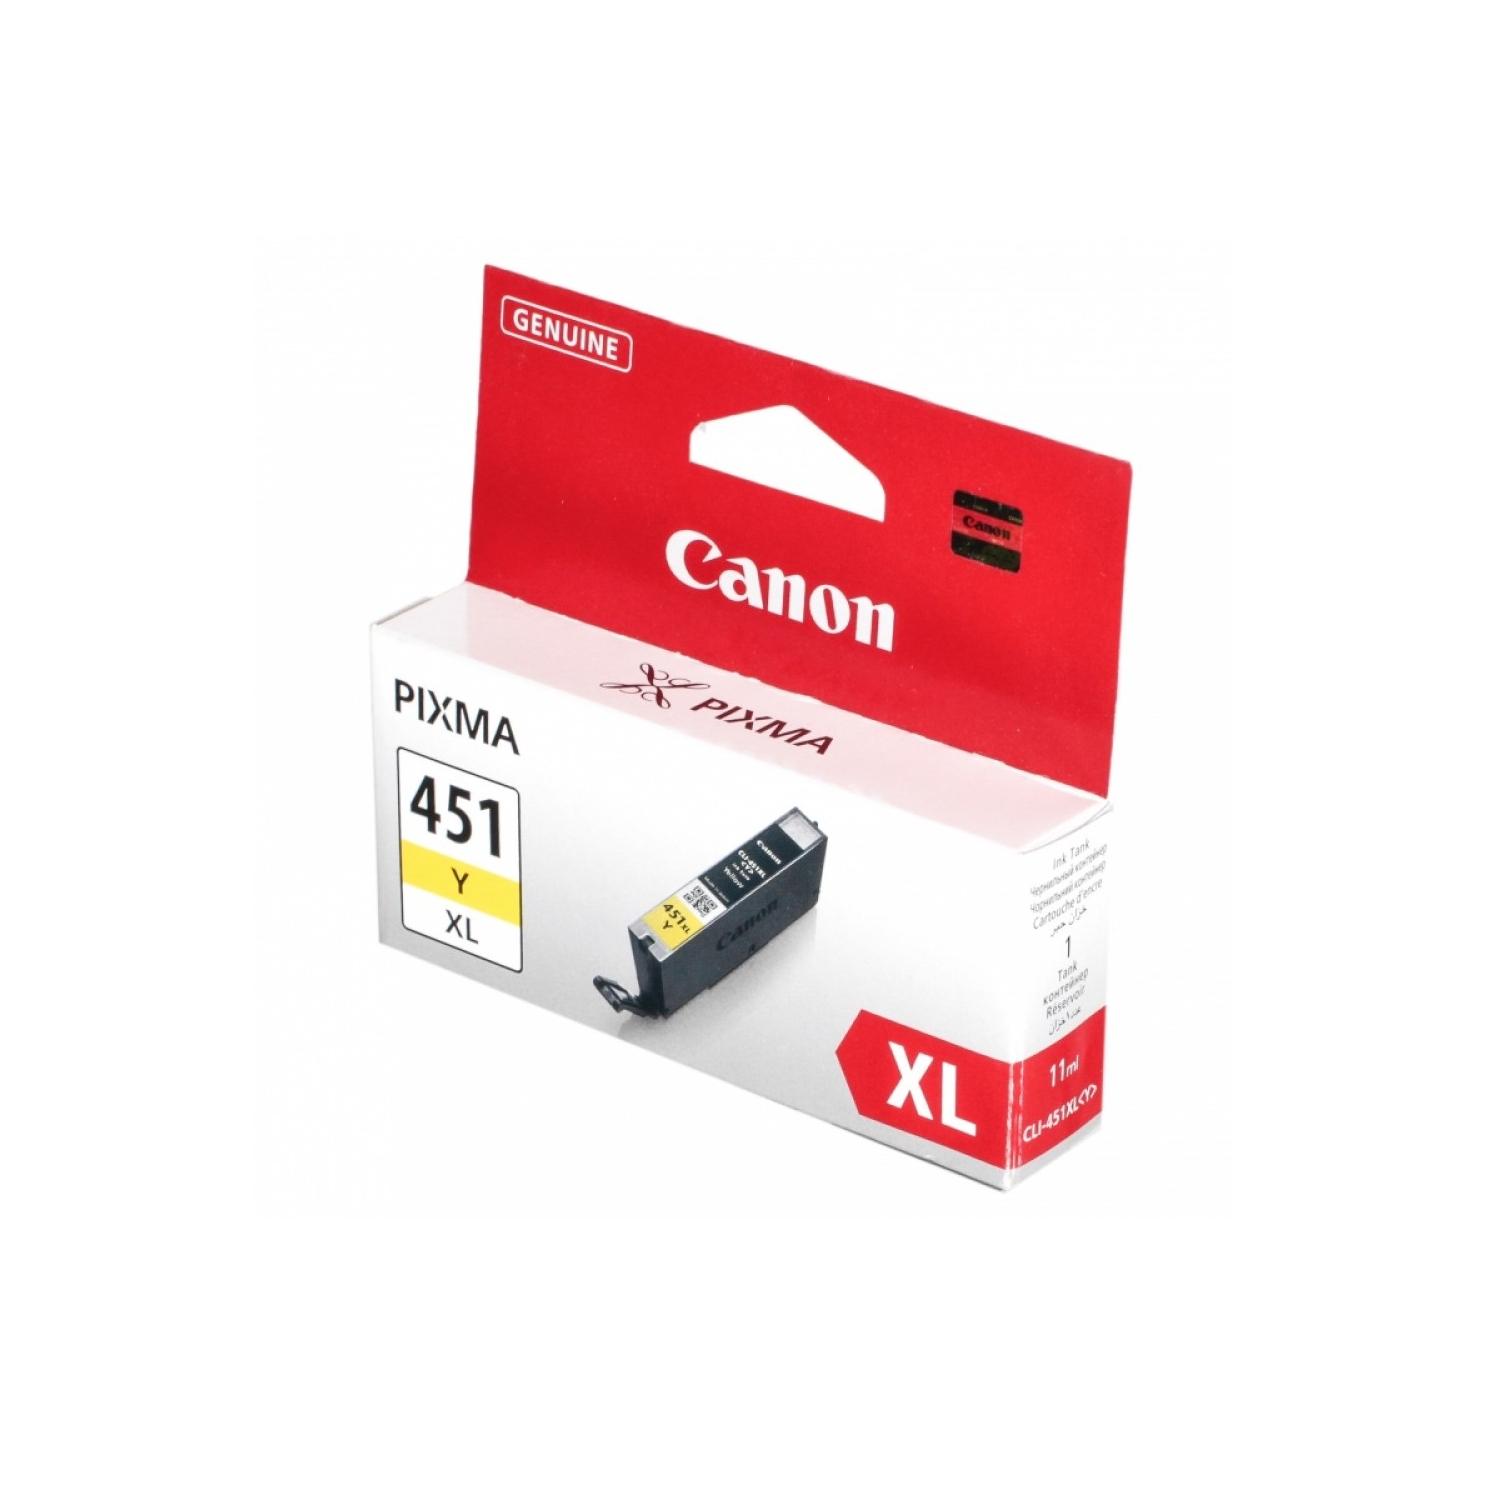 Струйный картридж CLI-451XL 6475B001